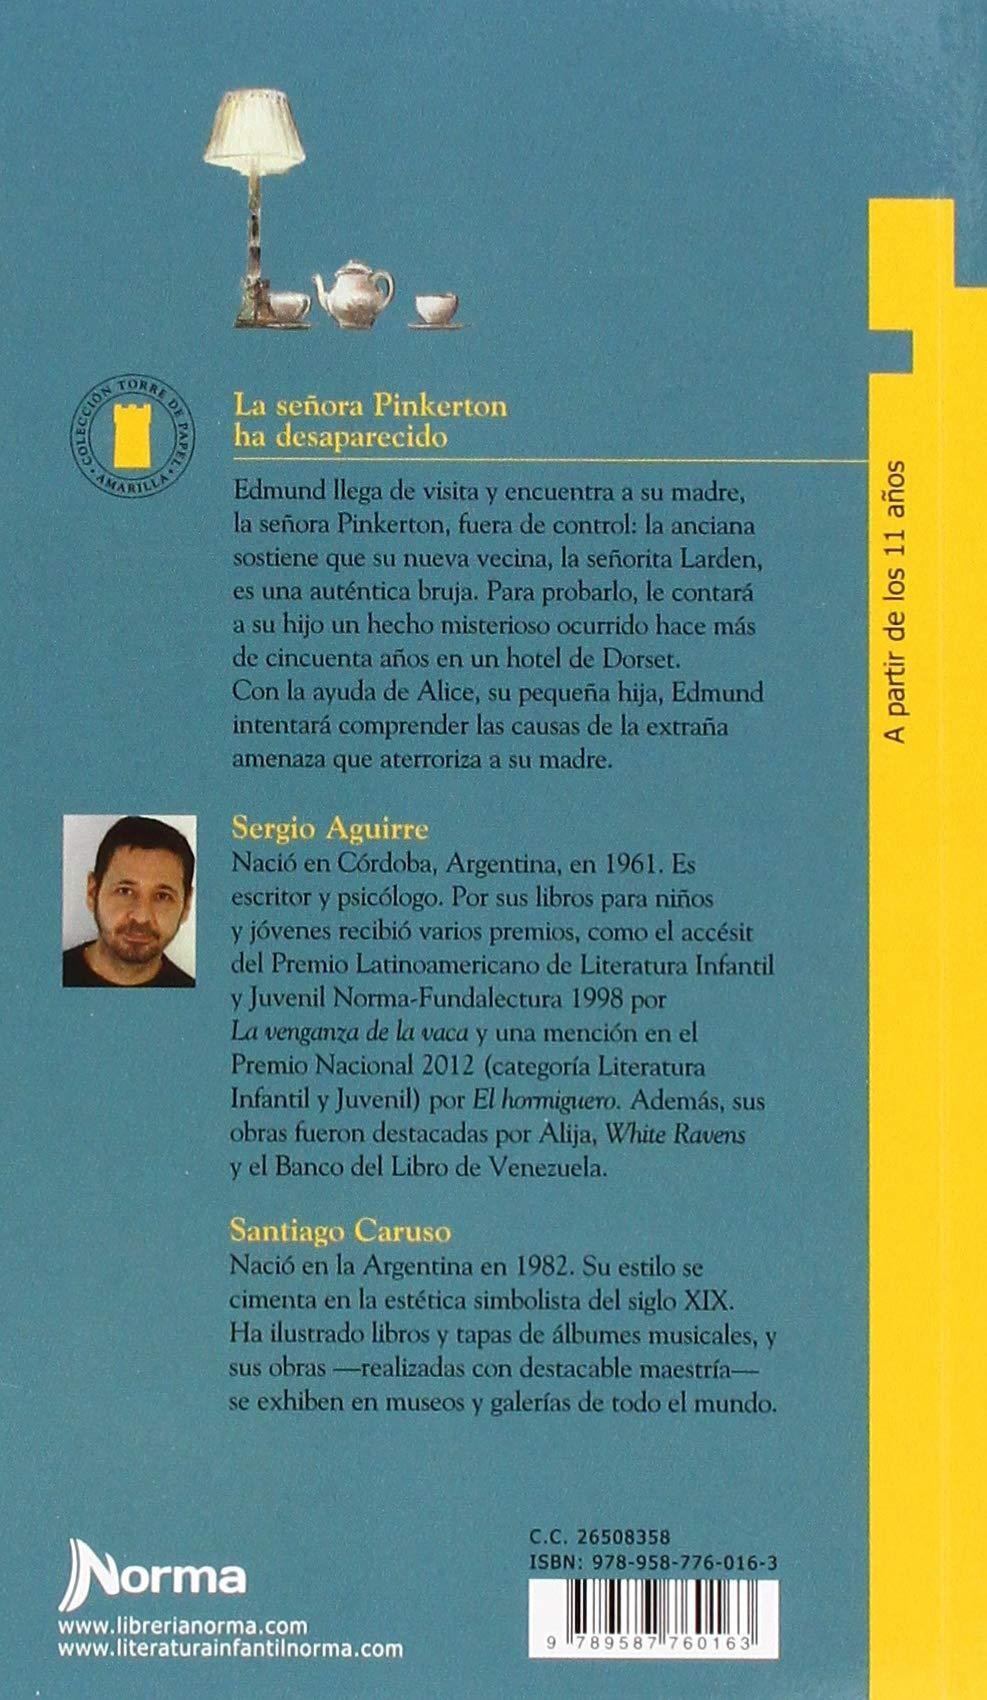 La Senora Pinkerton Ha Desaparecido (Torre de Papel Amarilla) (Spanish Edition): Sergio Aguirre, Santiago Caruso: 9789587760163: Amazon.com: Books